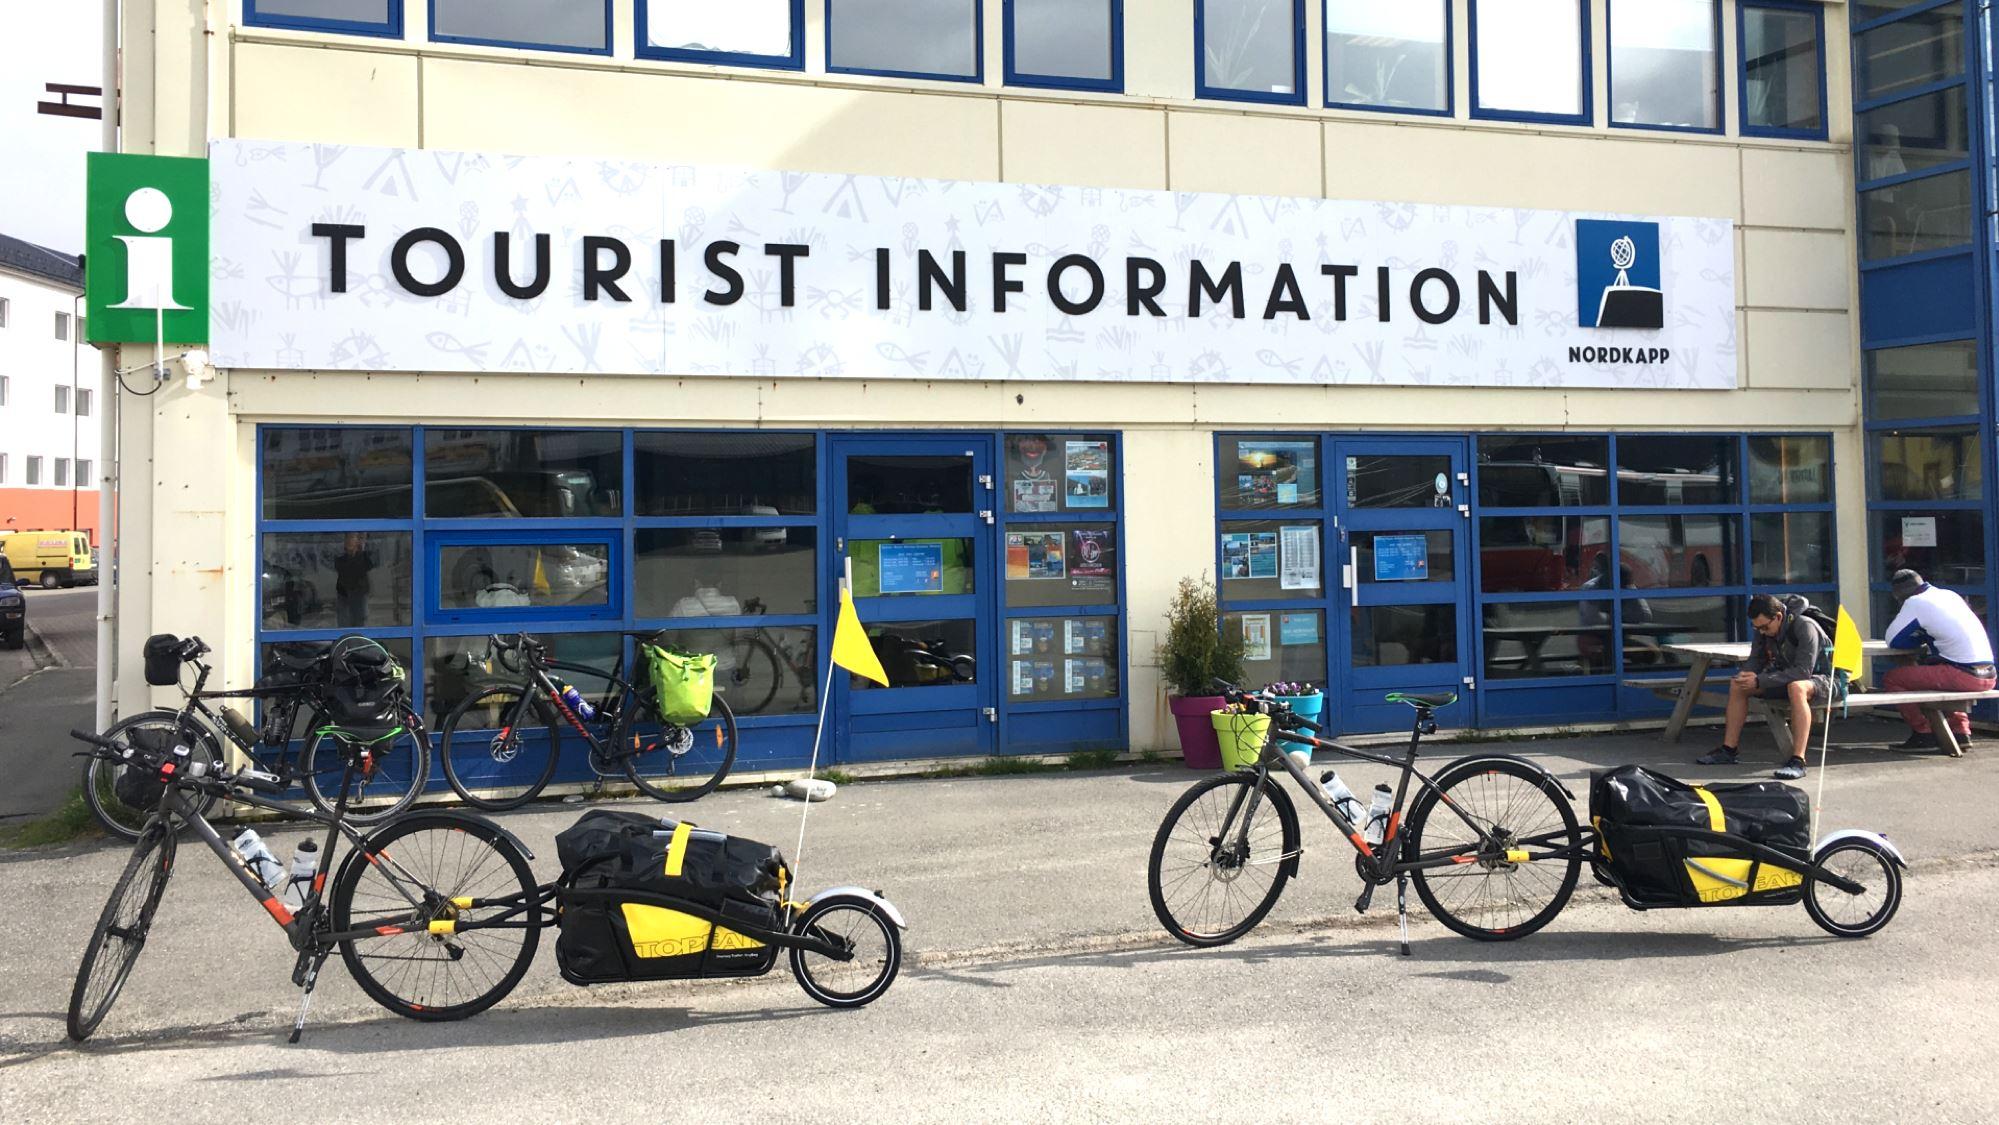 North Cape Tourist Information